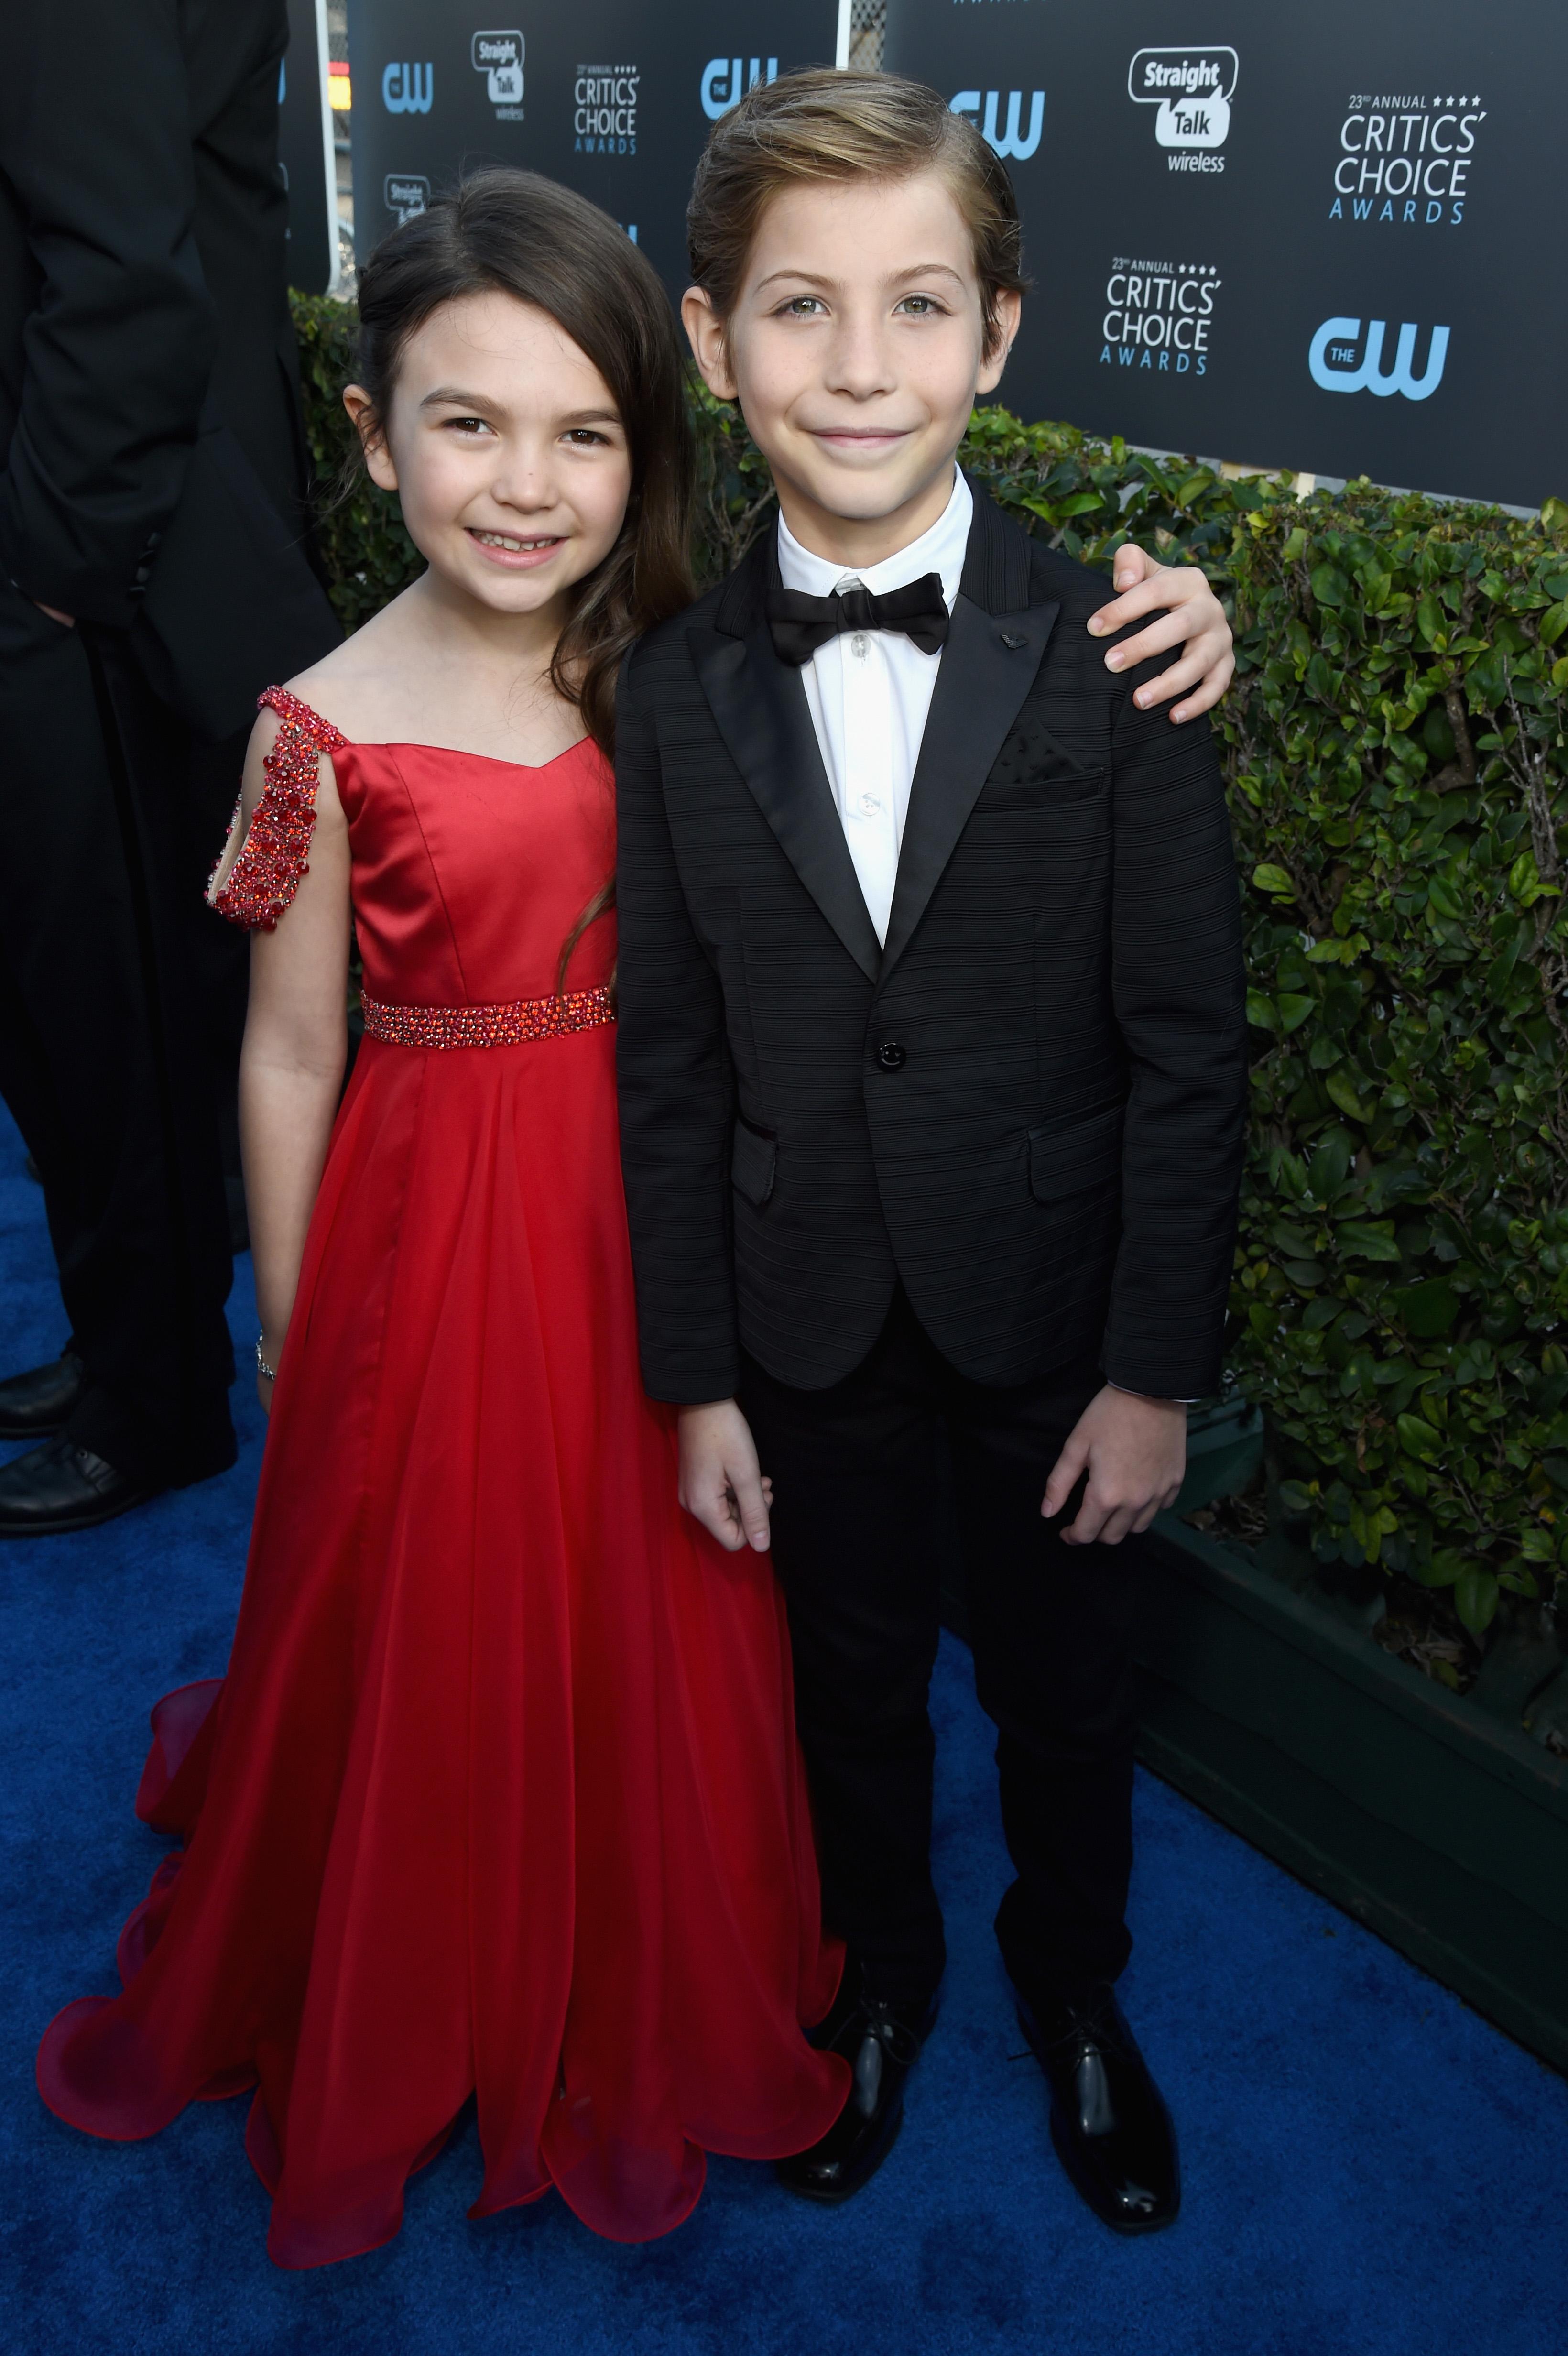 Brooklynn Prince and Jacob Tremblay attend The 23rd Annual Critics' Choice Awards at Barker Hangar on January 11, 2018 in Santa Monica, Calif